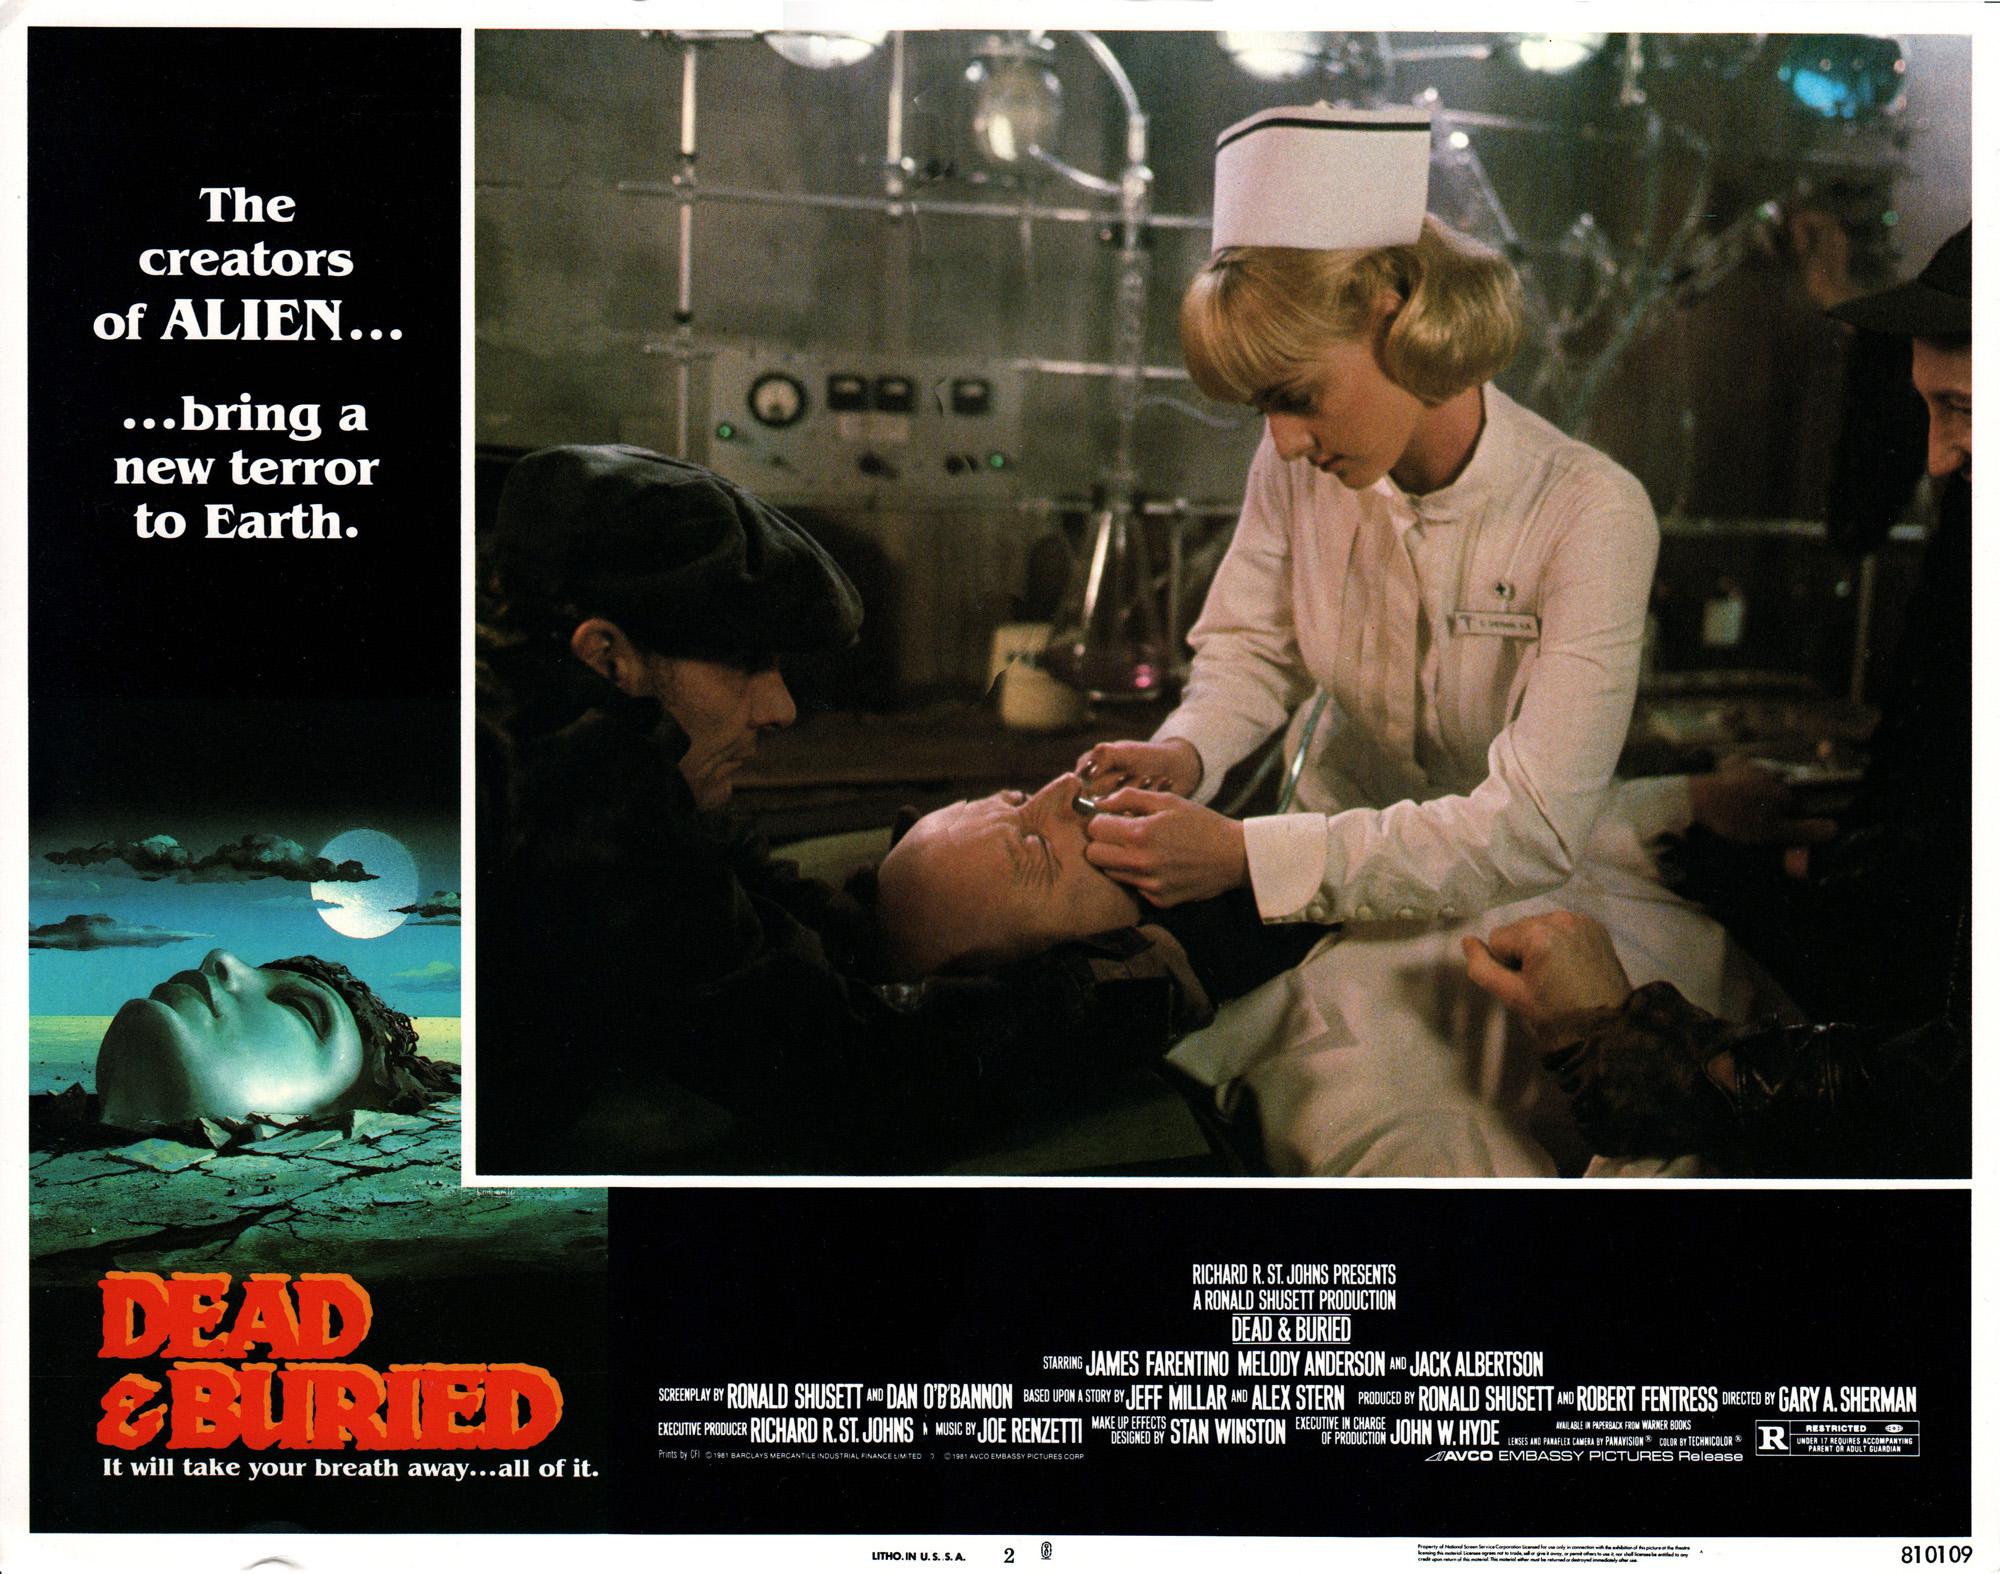 deadandburied-usa-04